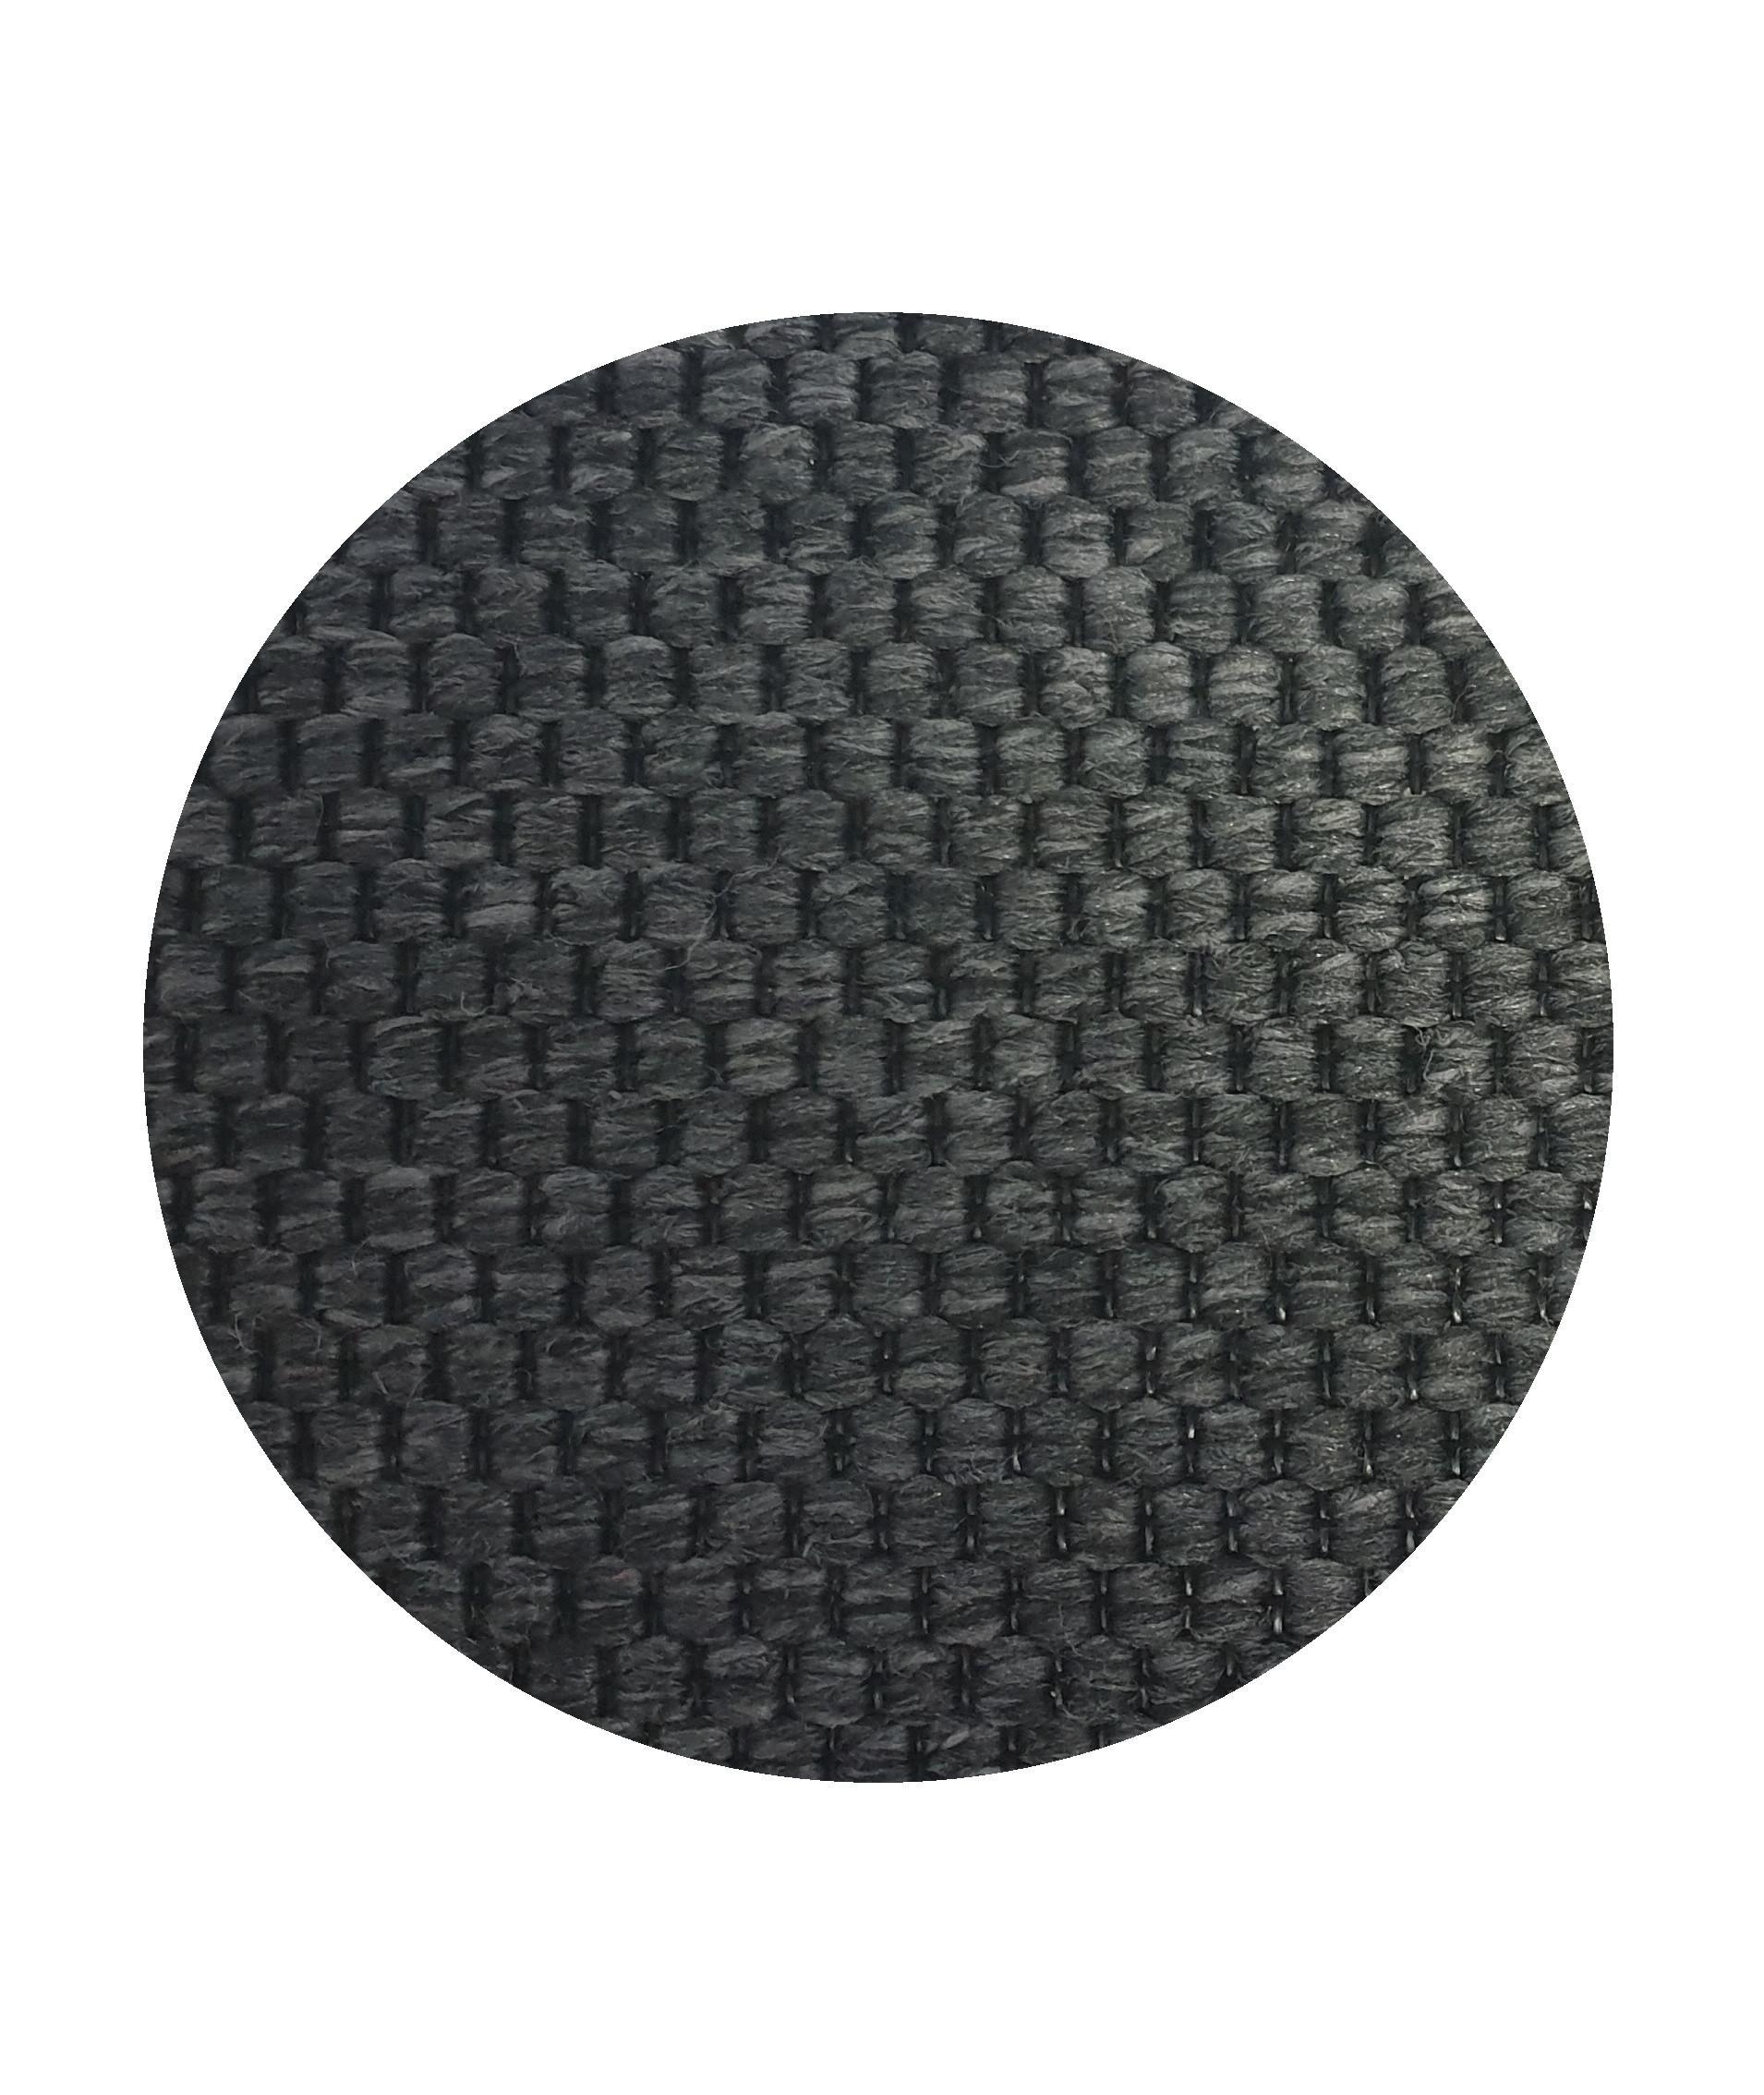 Vopi koberce Kusový koberec Nature antracit kulatý - 120x120 (průměr) kruh cm